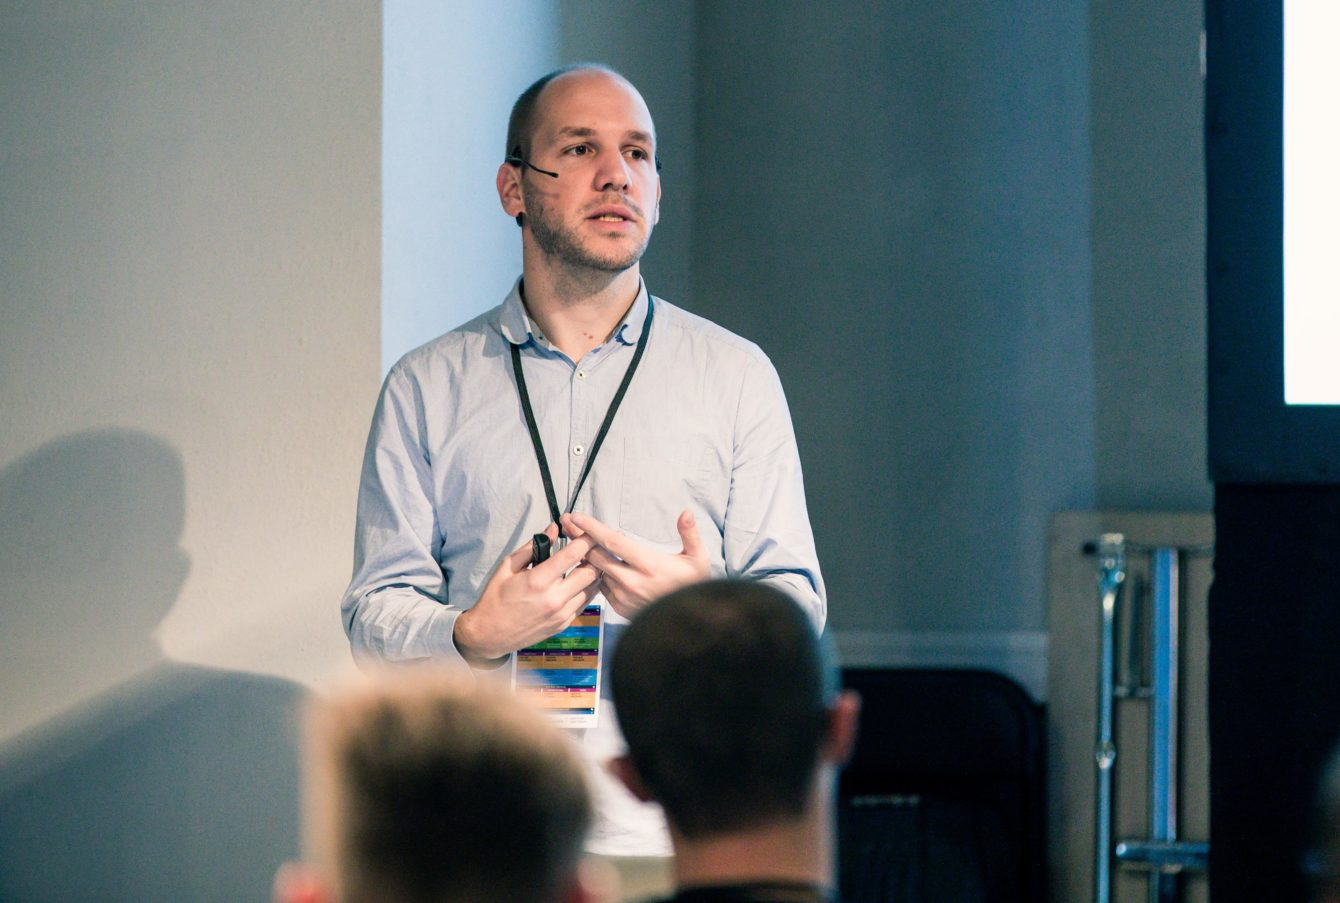 Florian Lorétan speaking at DrupalCamp Baltics 2018